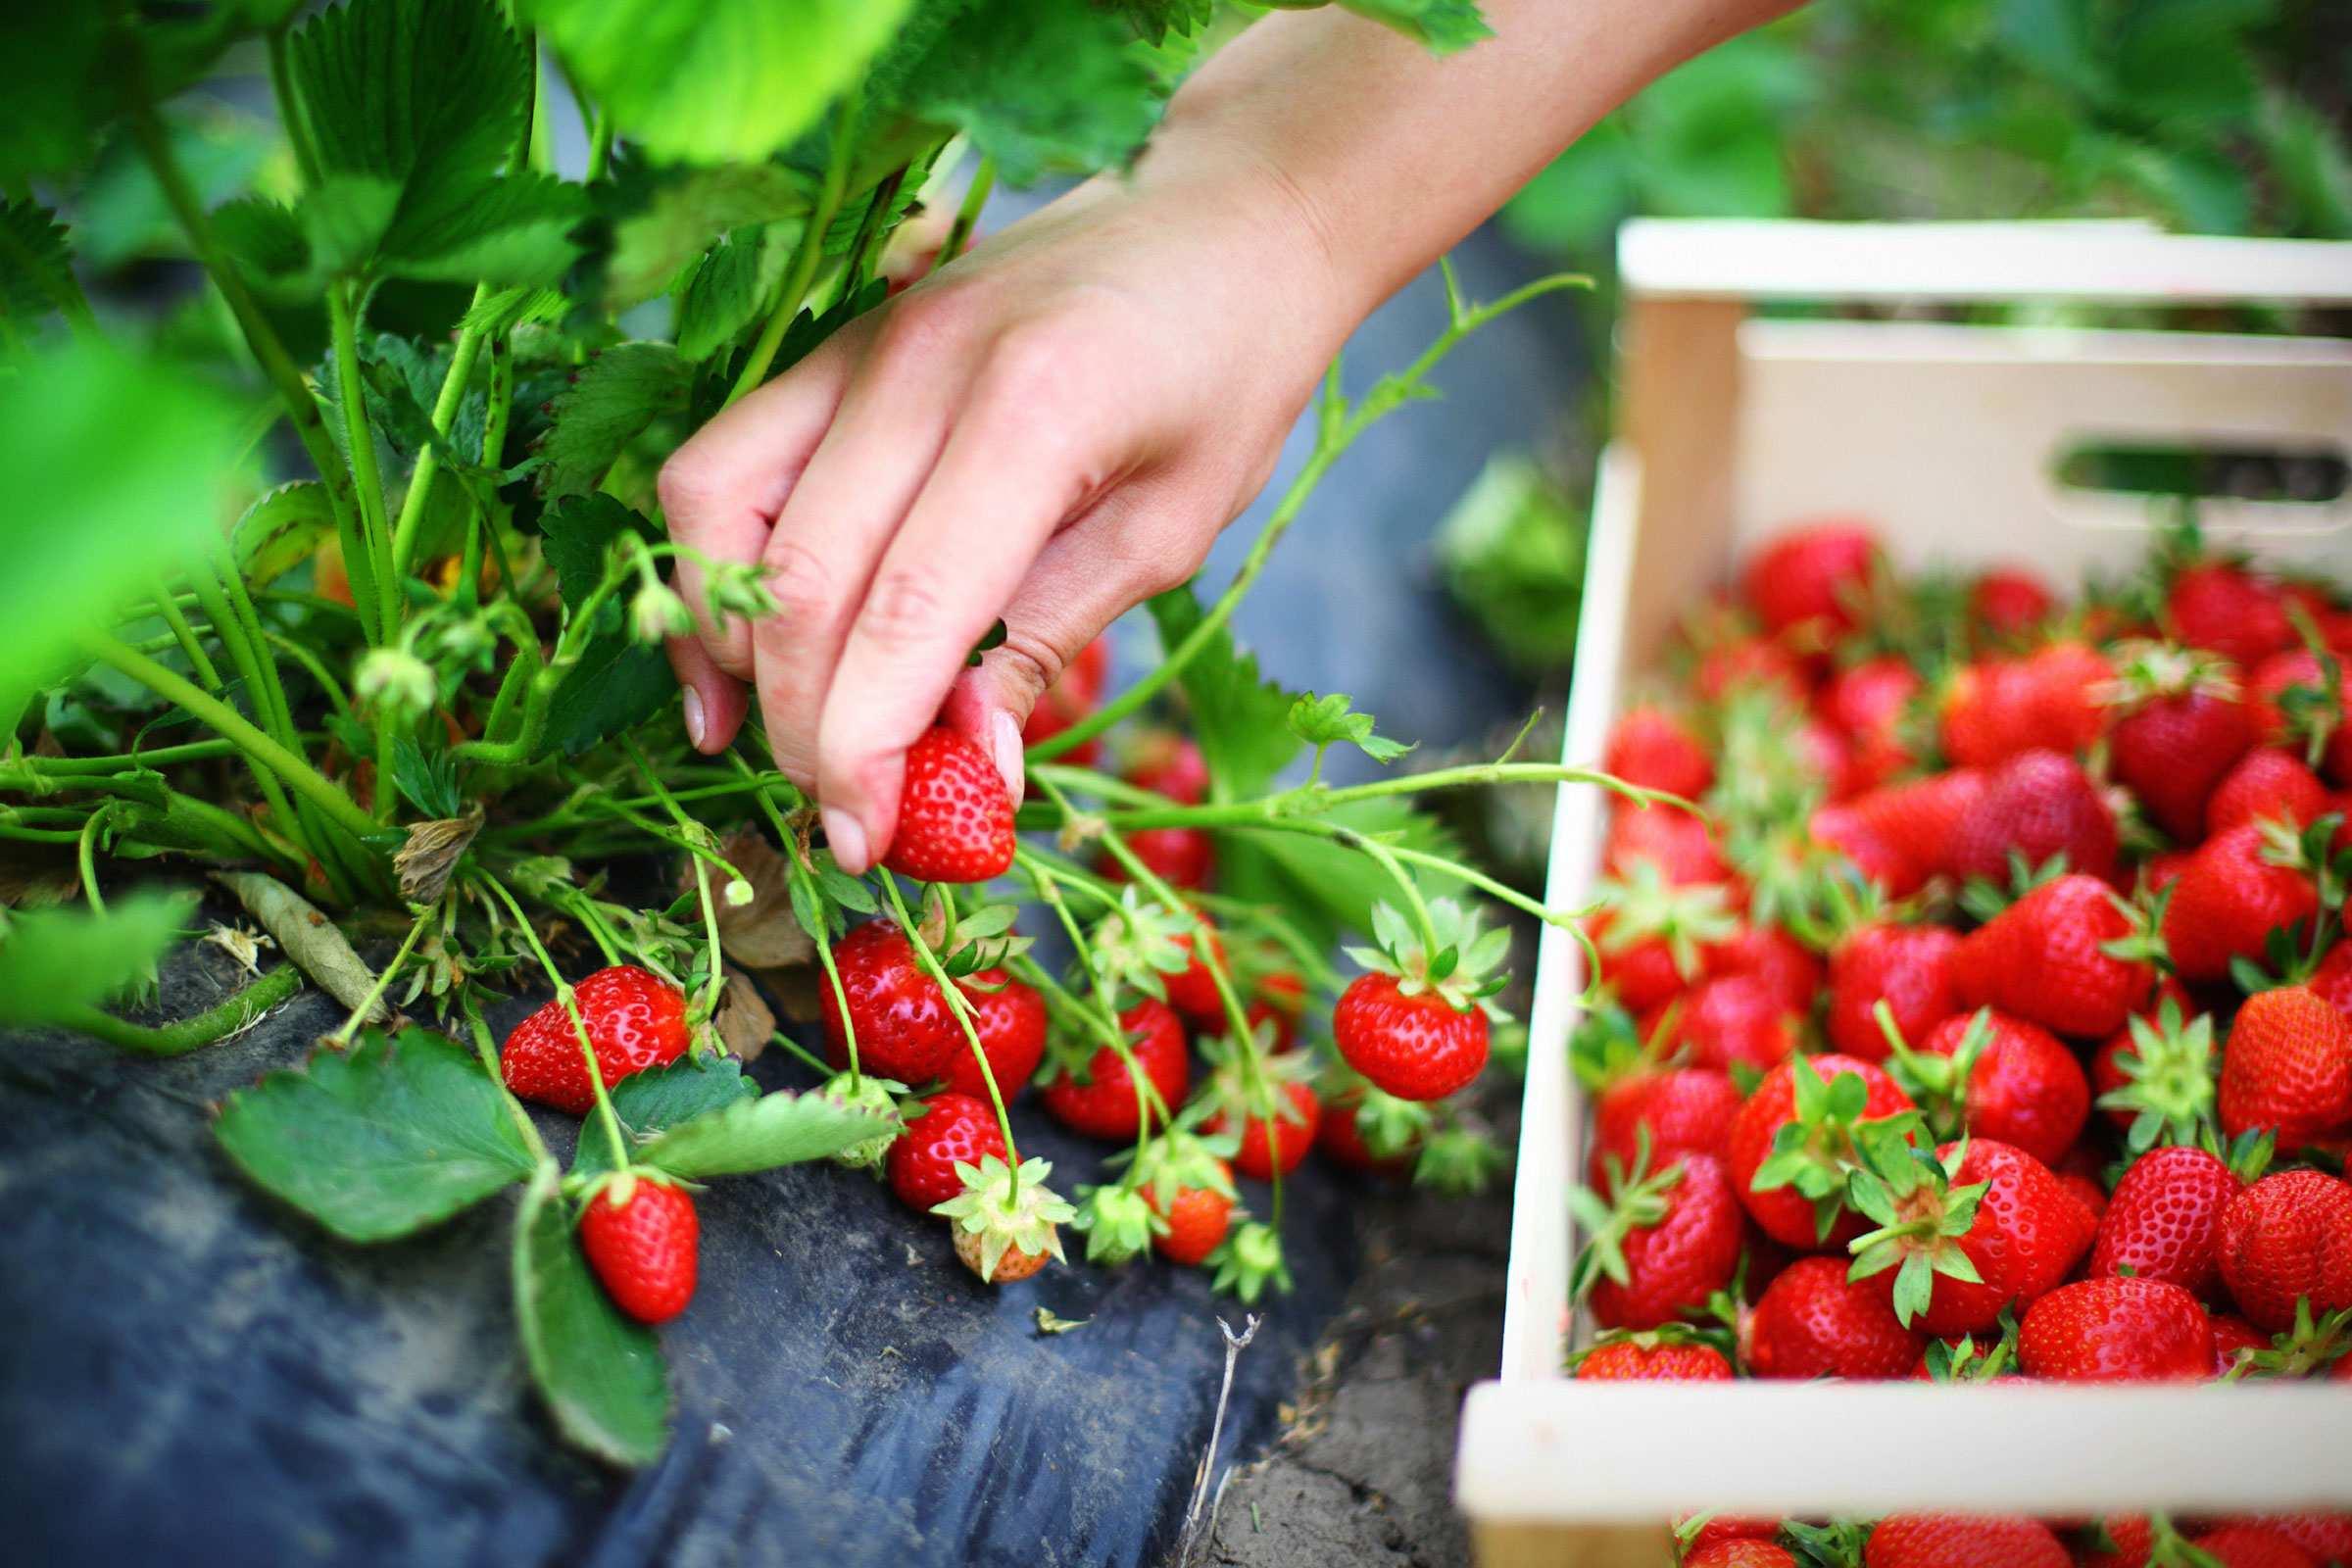 محصولات ارگانیک,ارگانیک,تشخیص محصولات ارگانیک